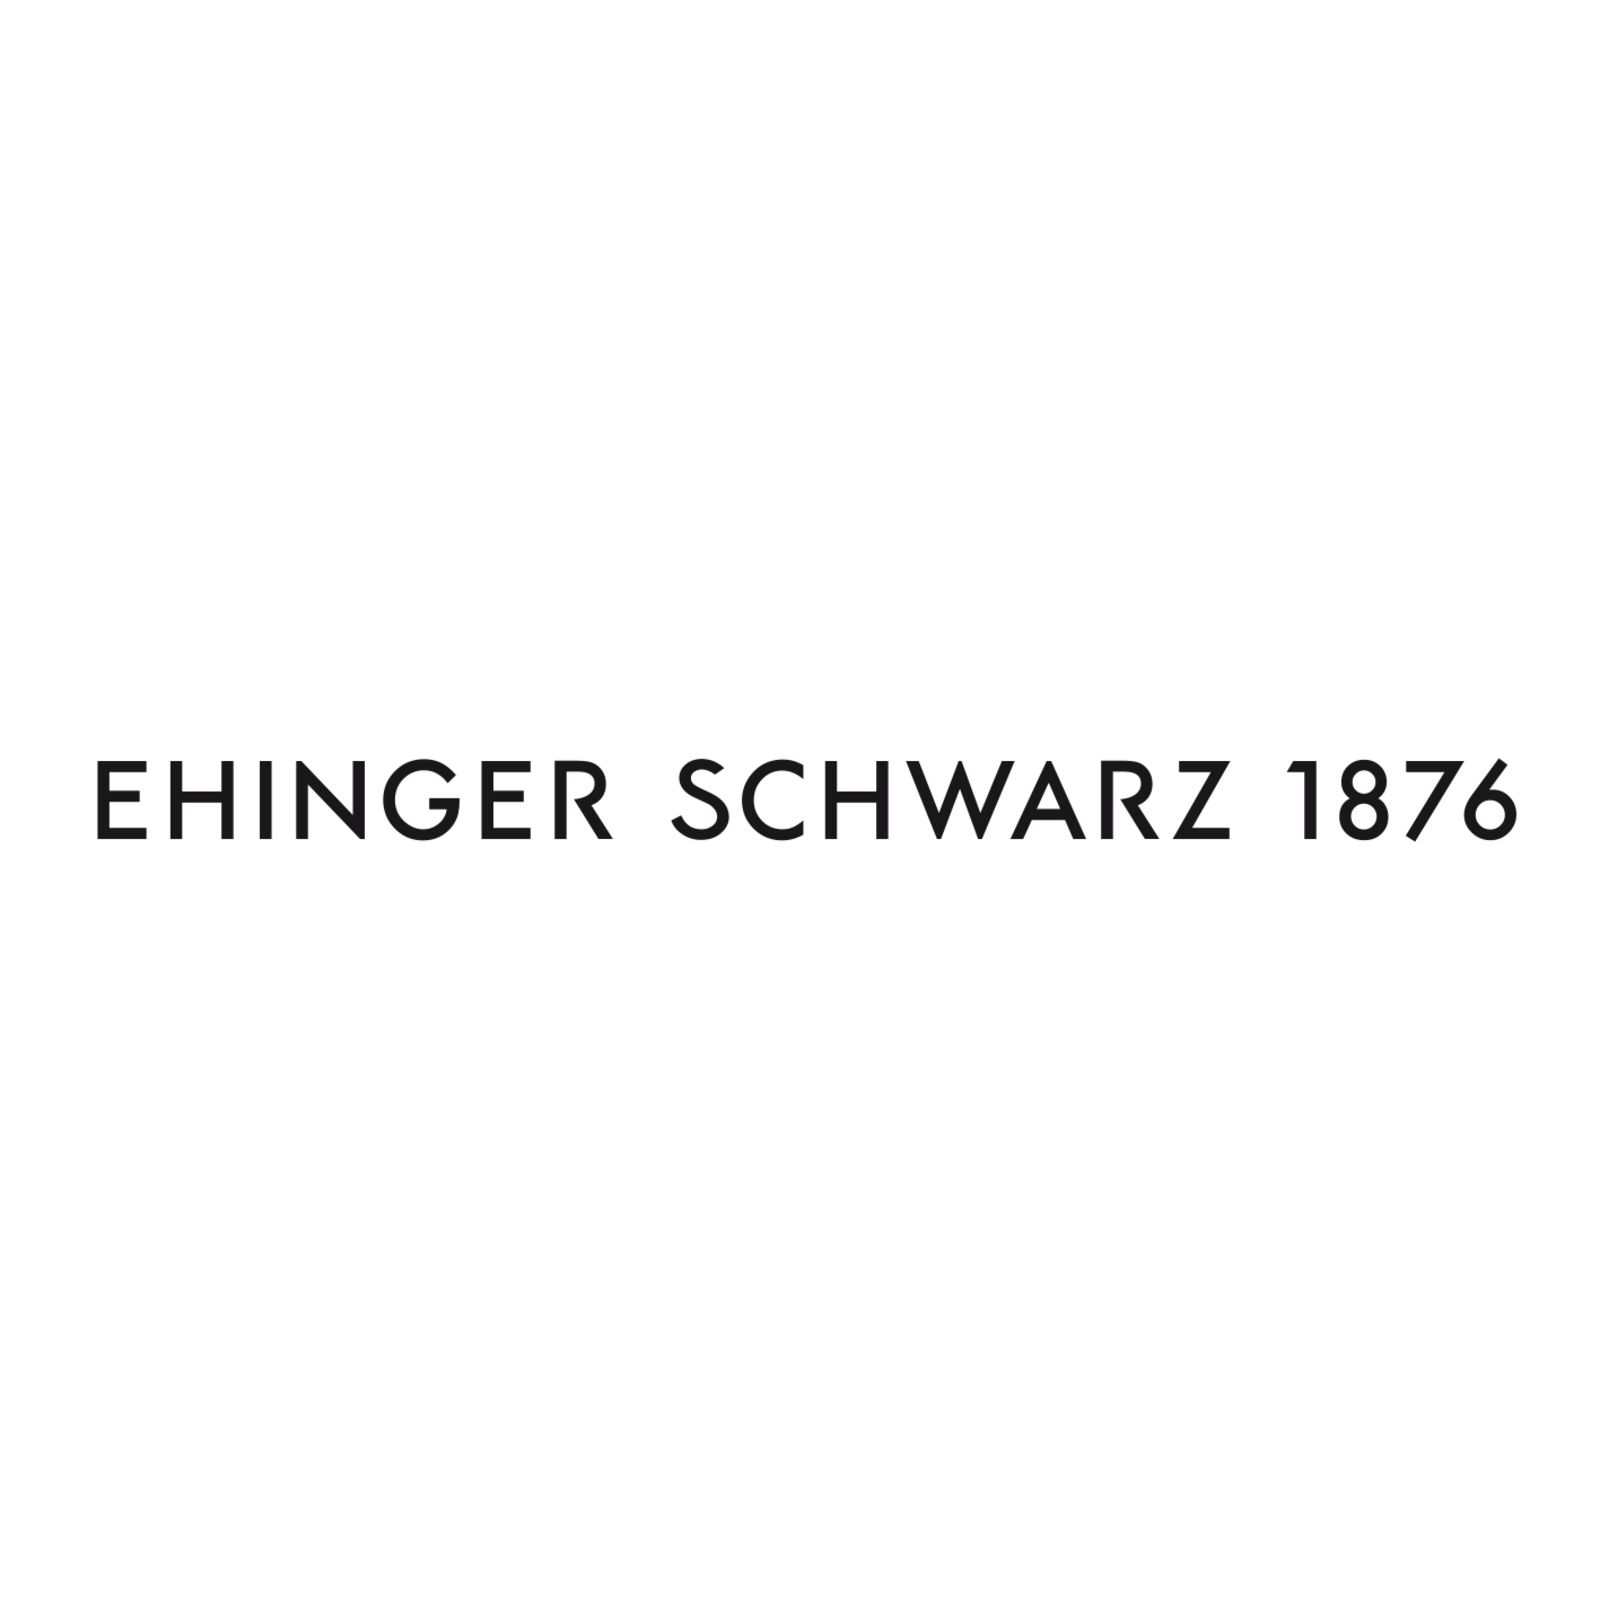 EHINGER-SCHWARZ 1876 (Bild 1)